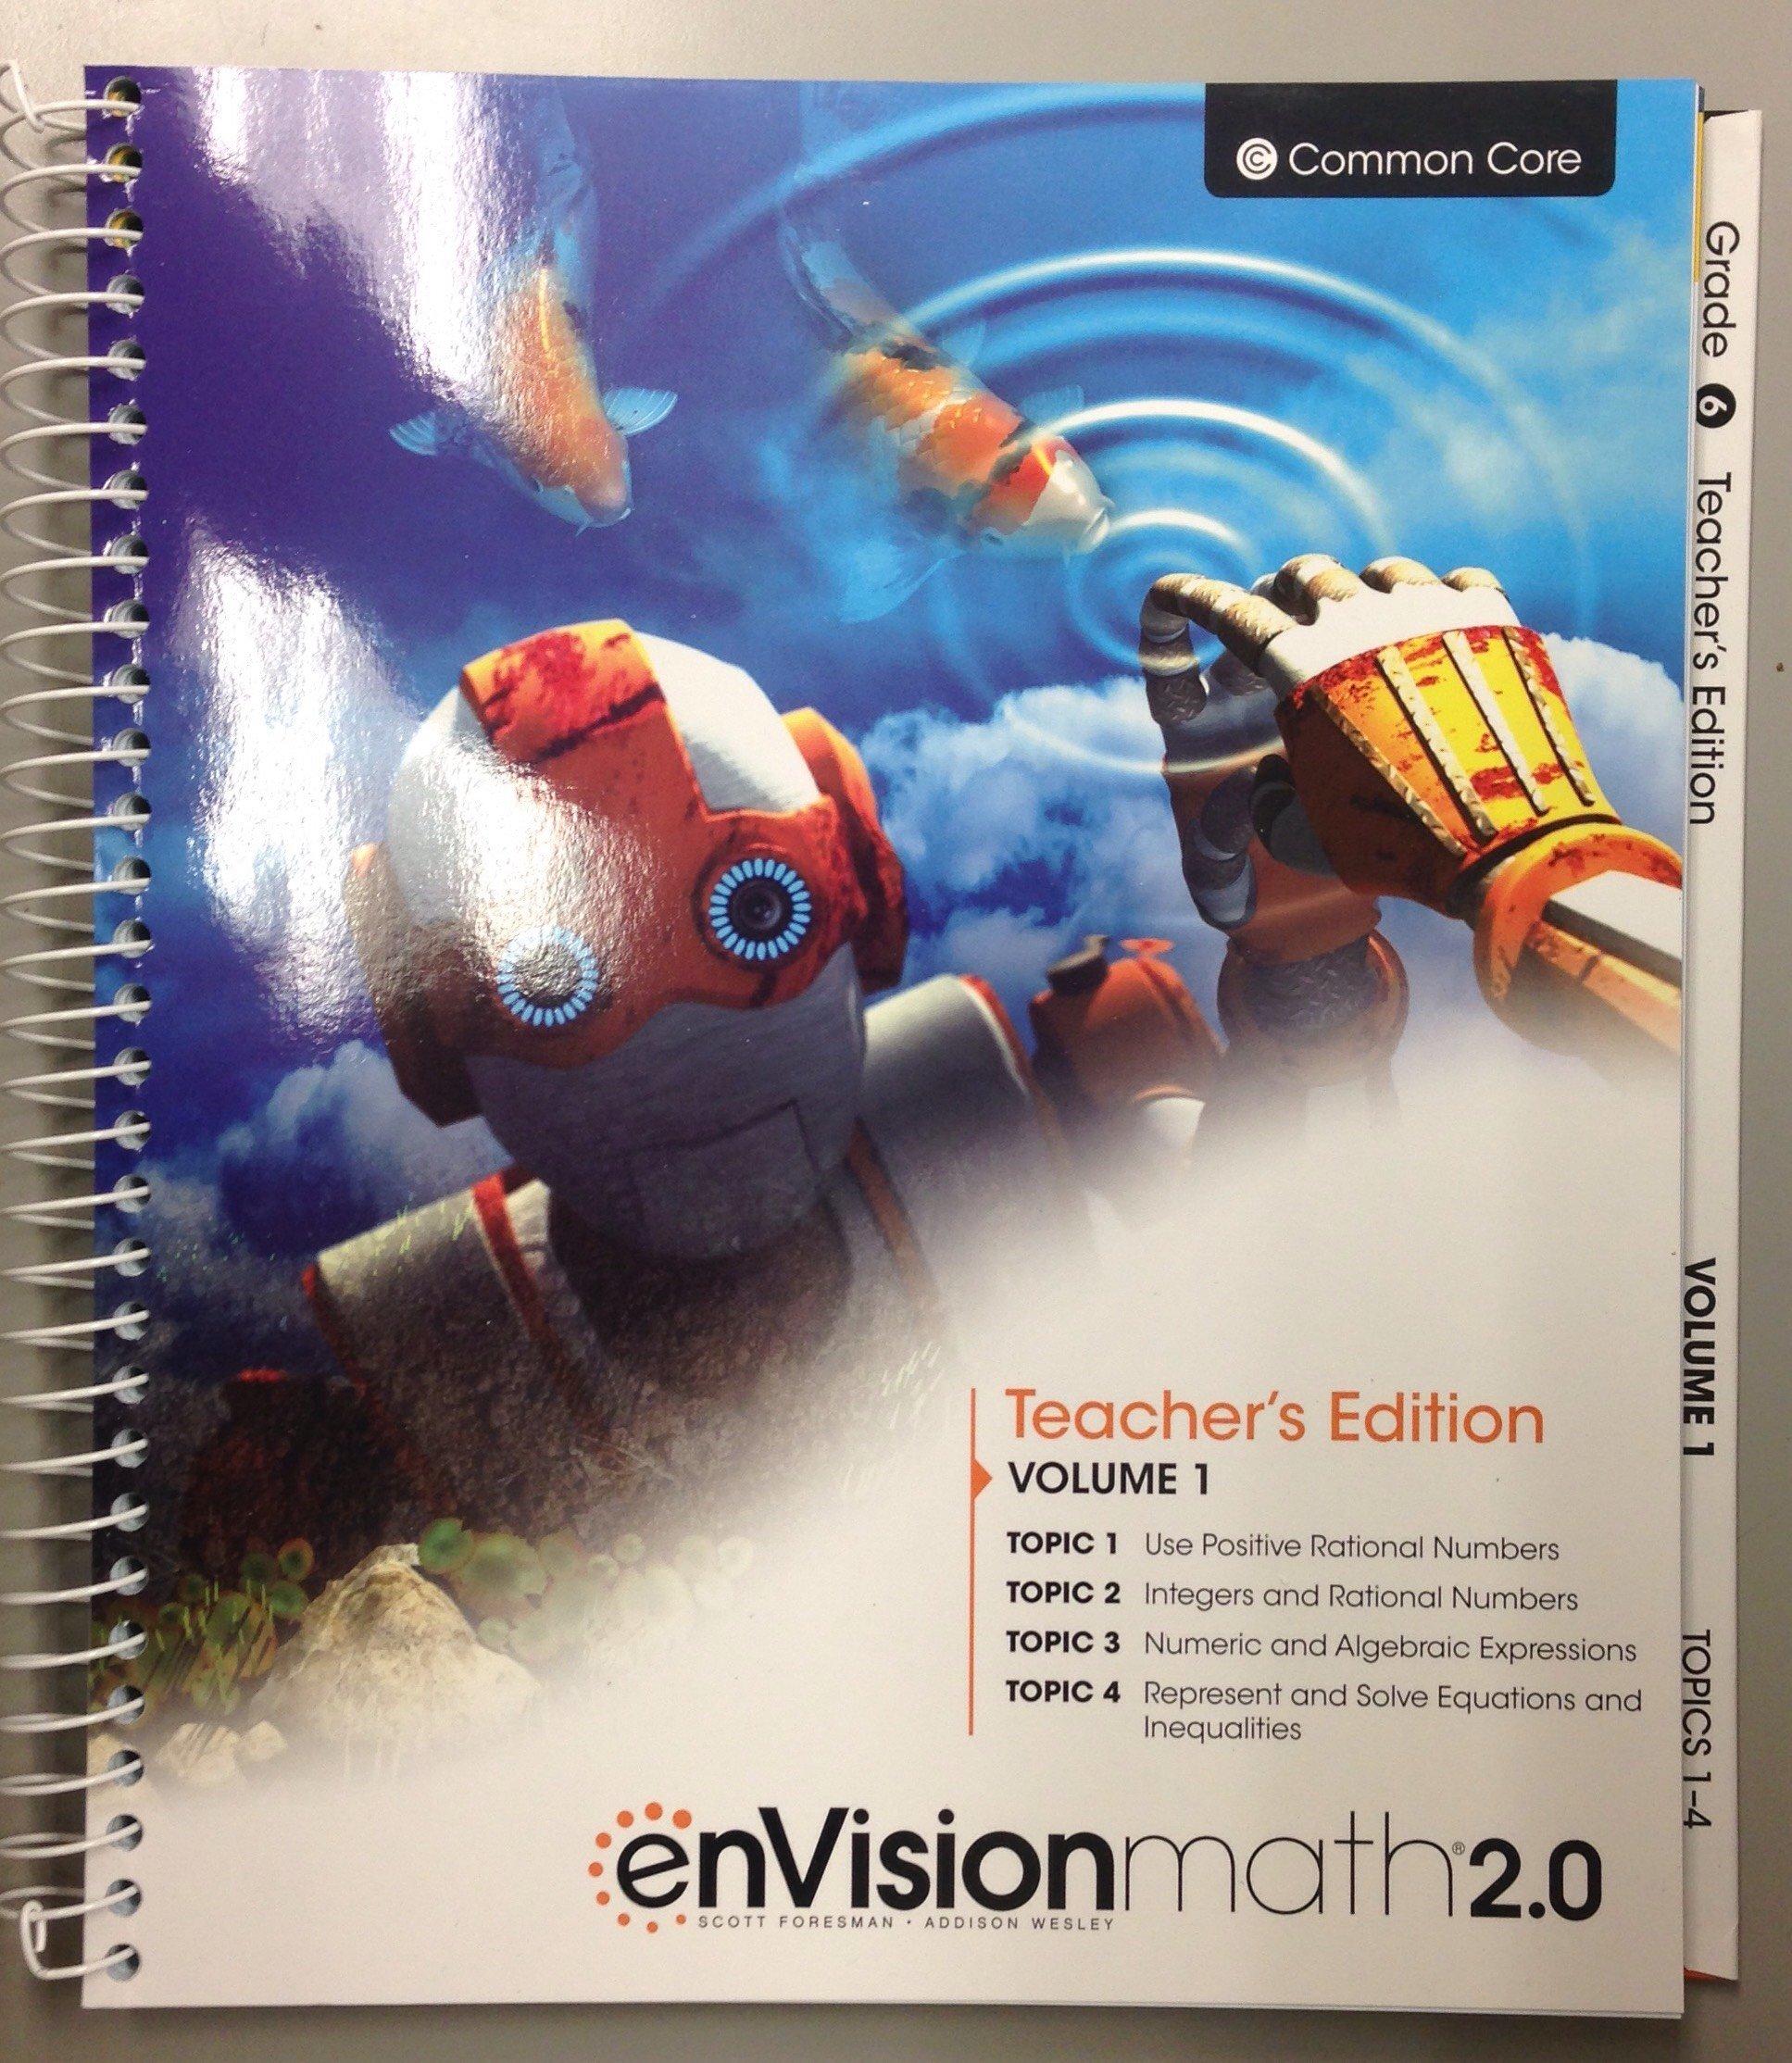 enVision math 2.0 - Grade 6 - Teacher's Edition - Volume One pdf